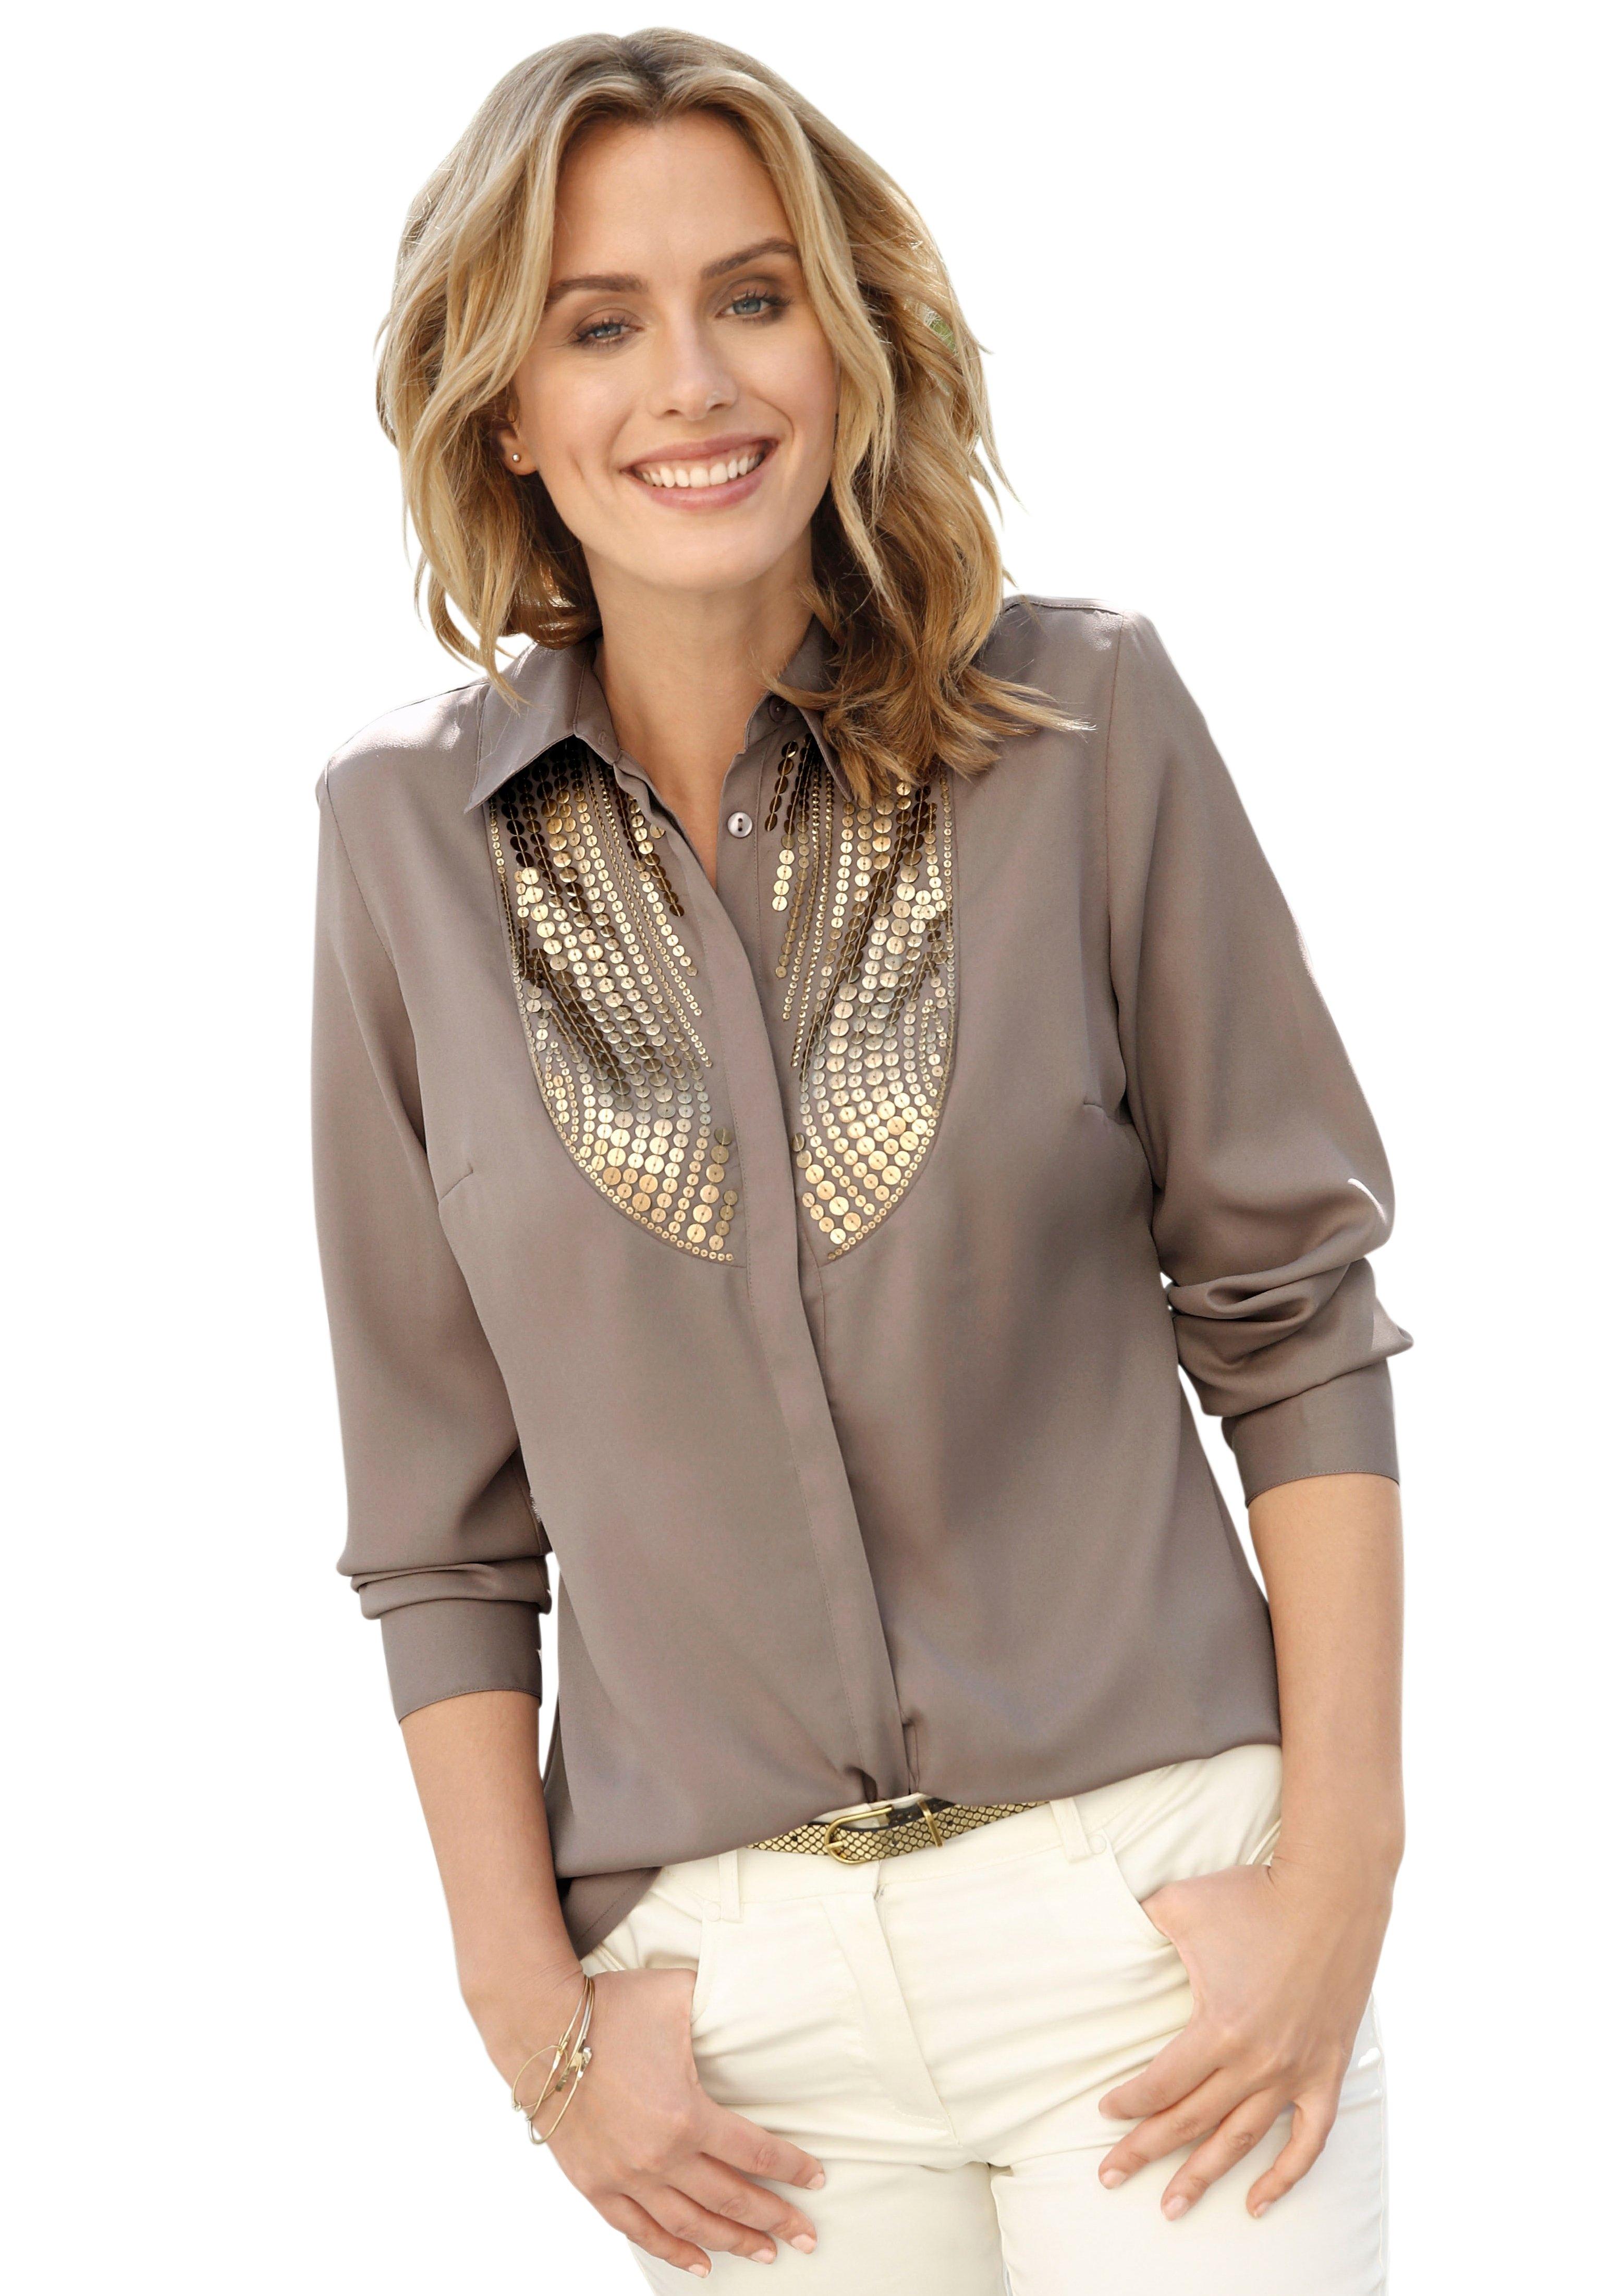 Création L blouse met glanzende pailletten nu online bestellen